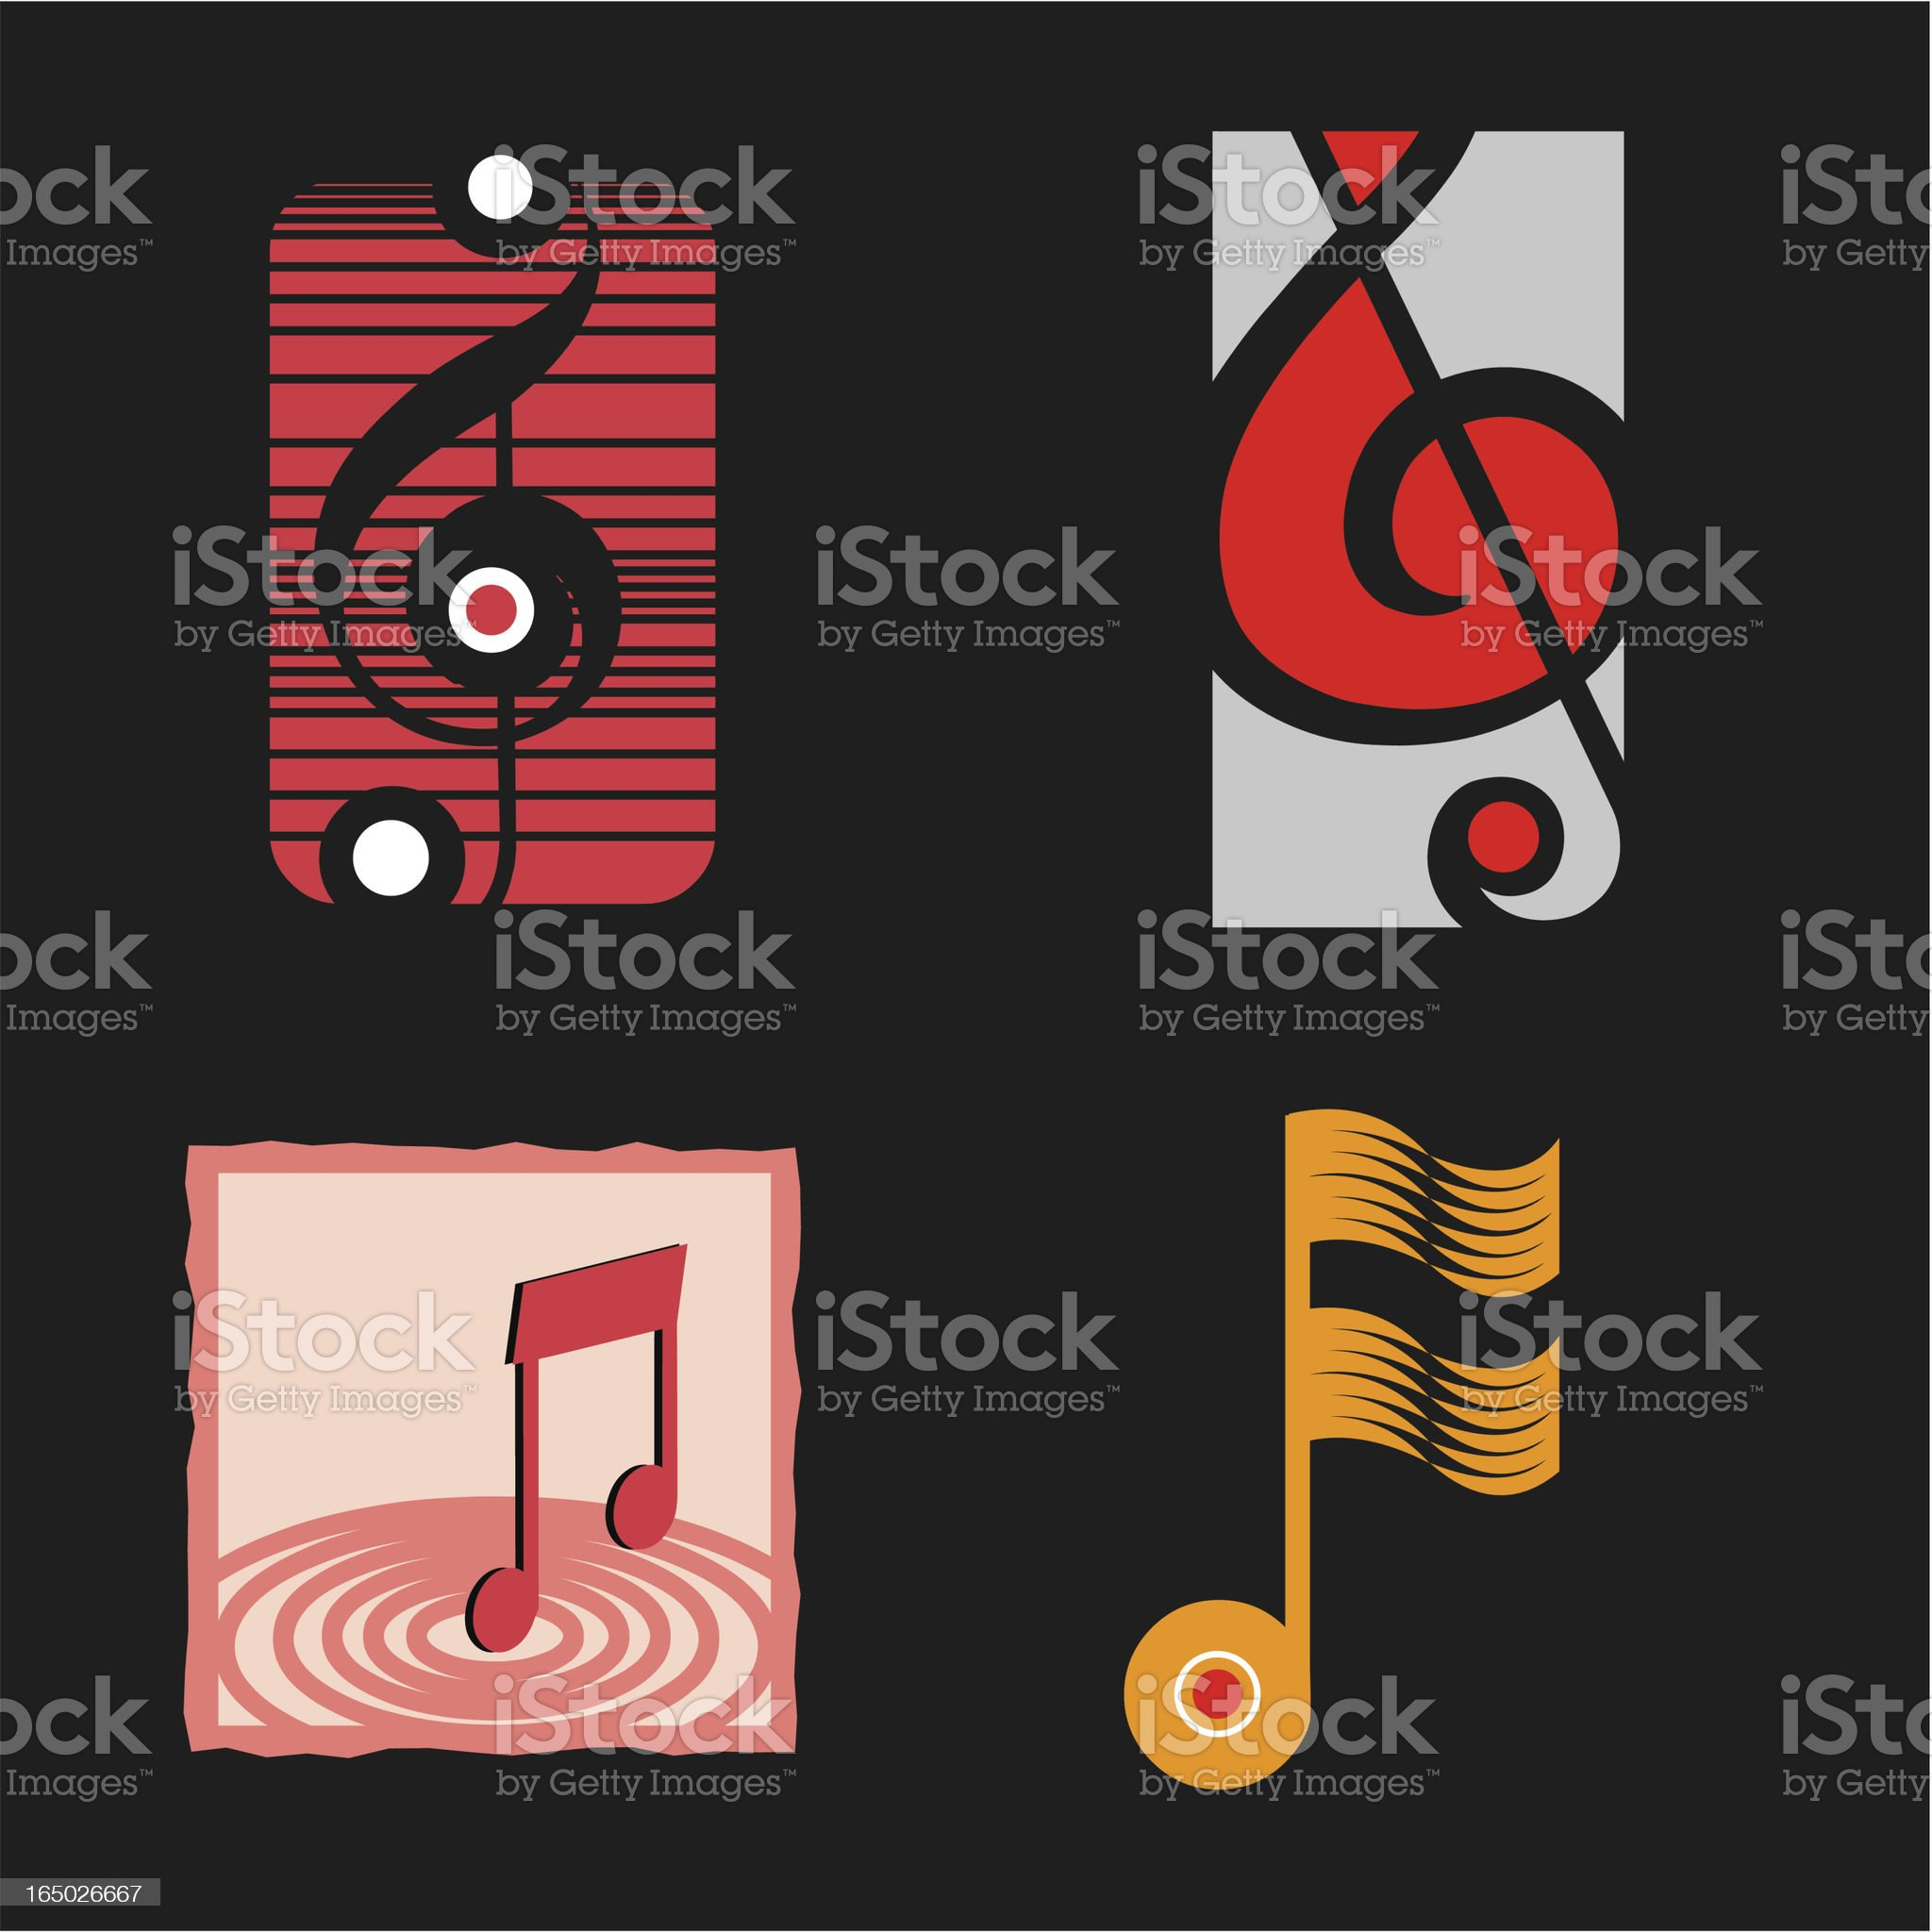 Music Symbols 2 - Vector royalty-free stock vector art